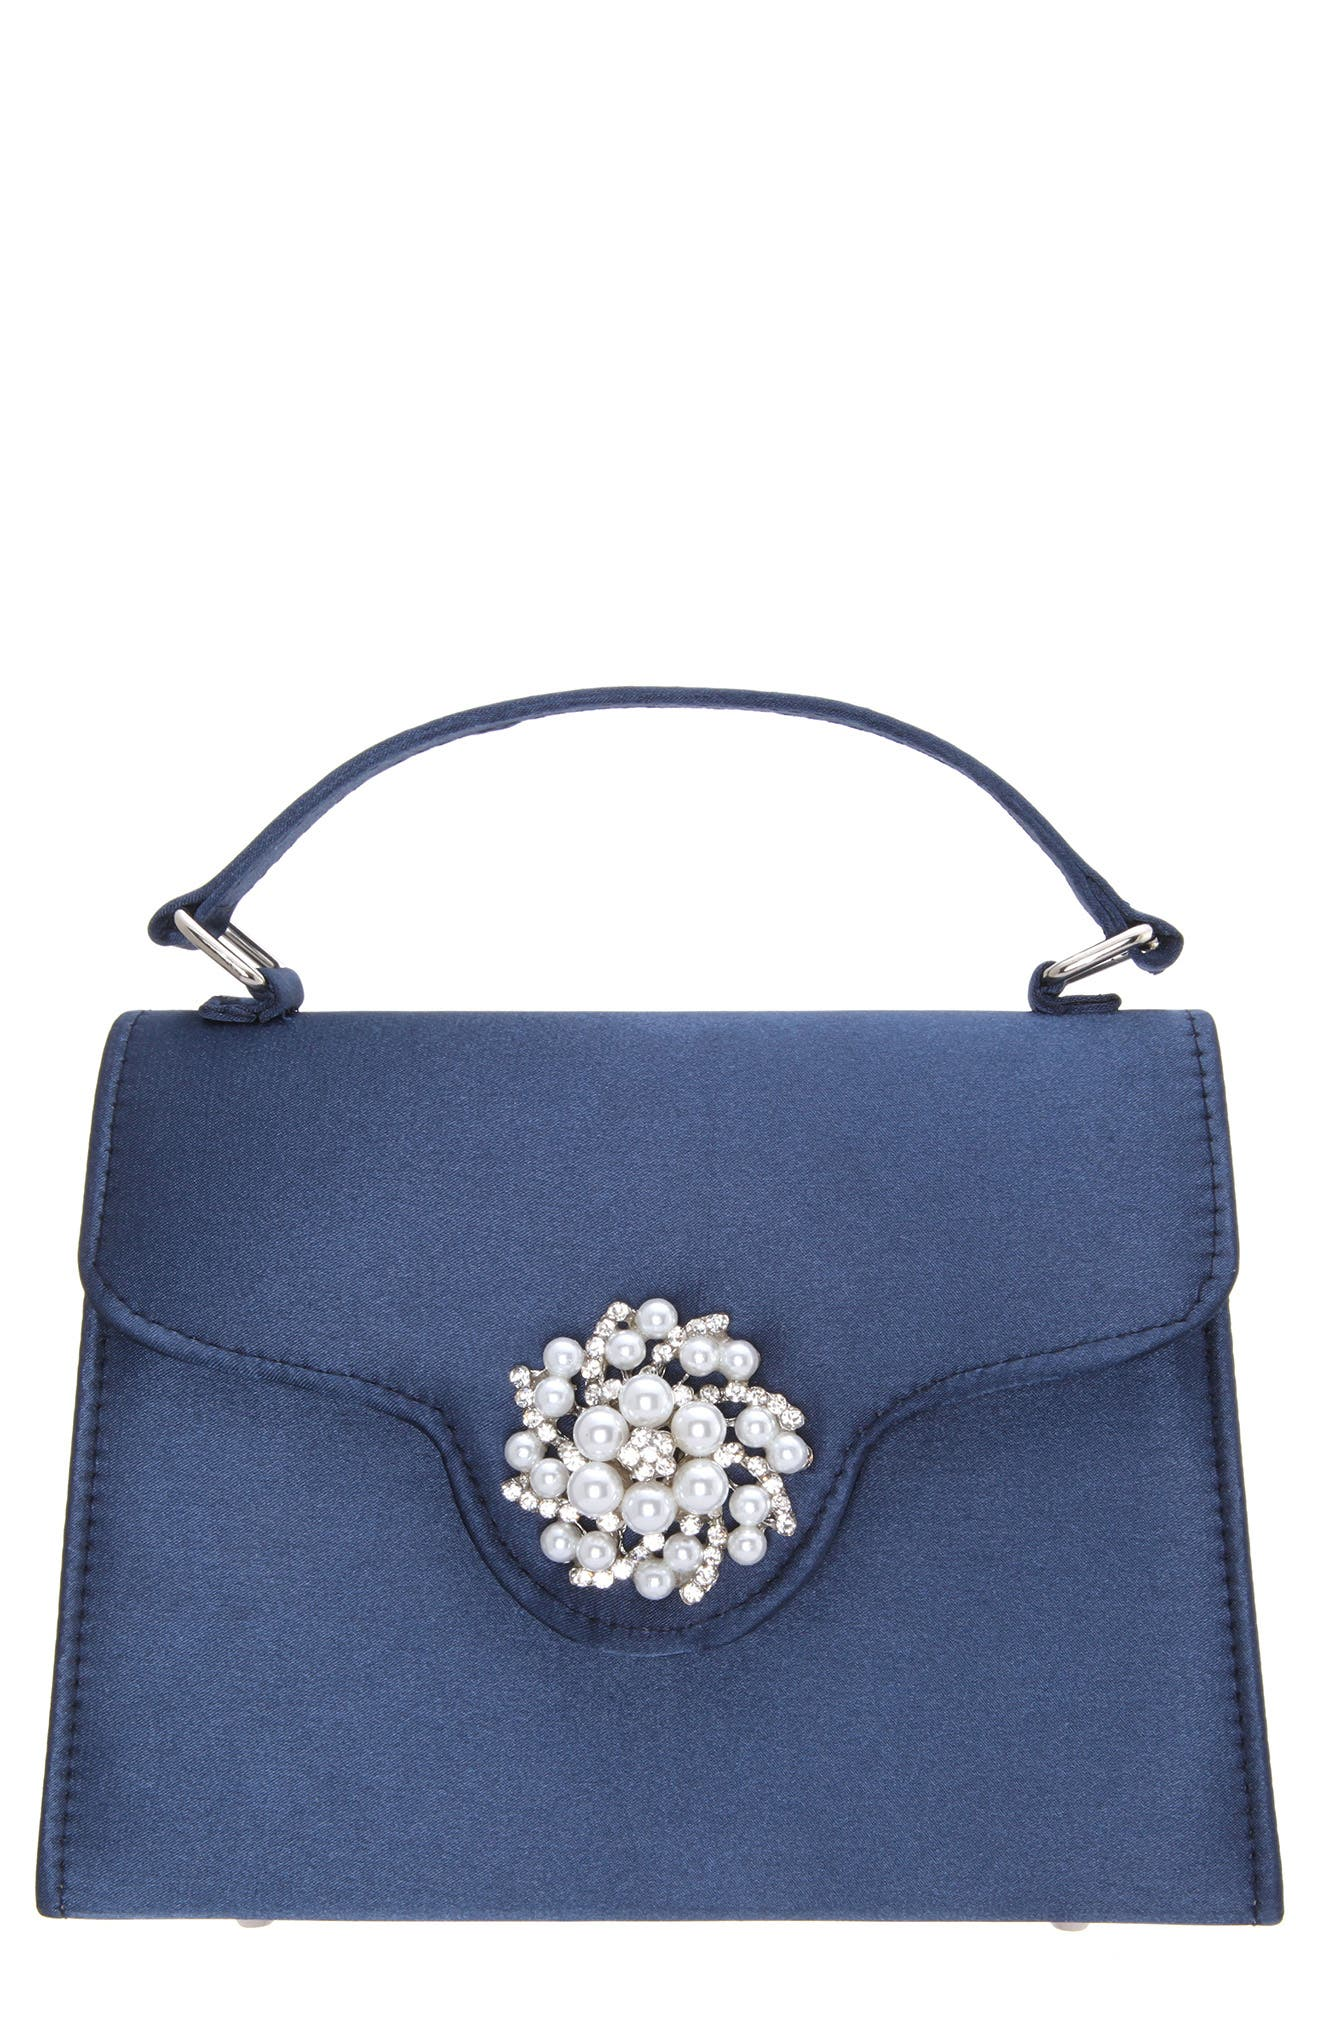 Imitation Pearl Ornament Lady Bag - Blue, Navy